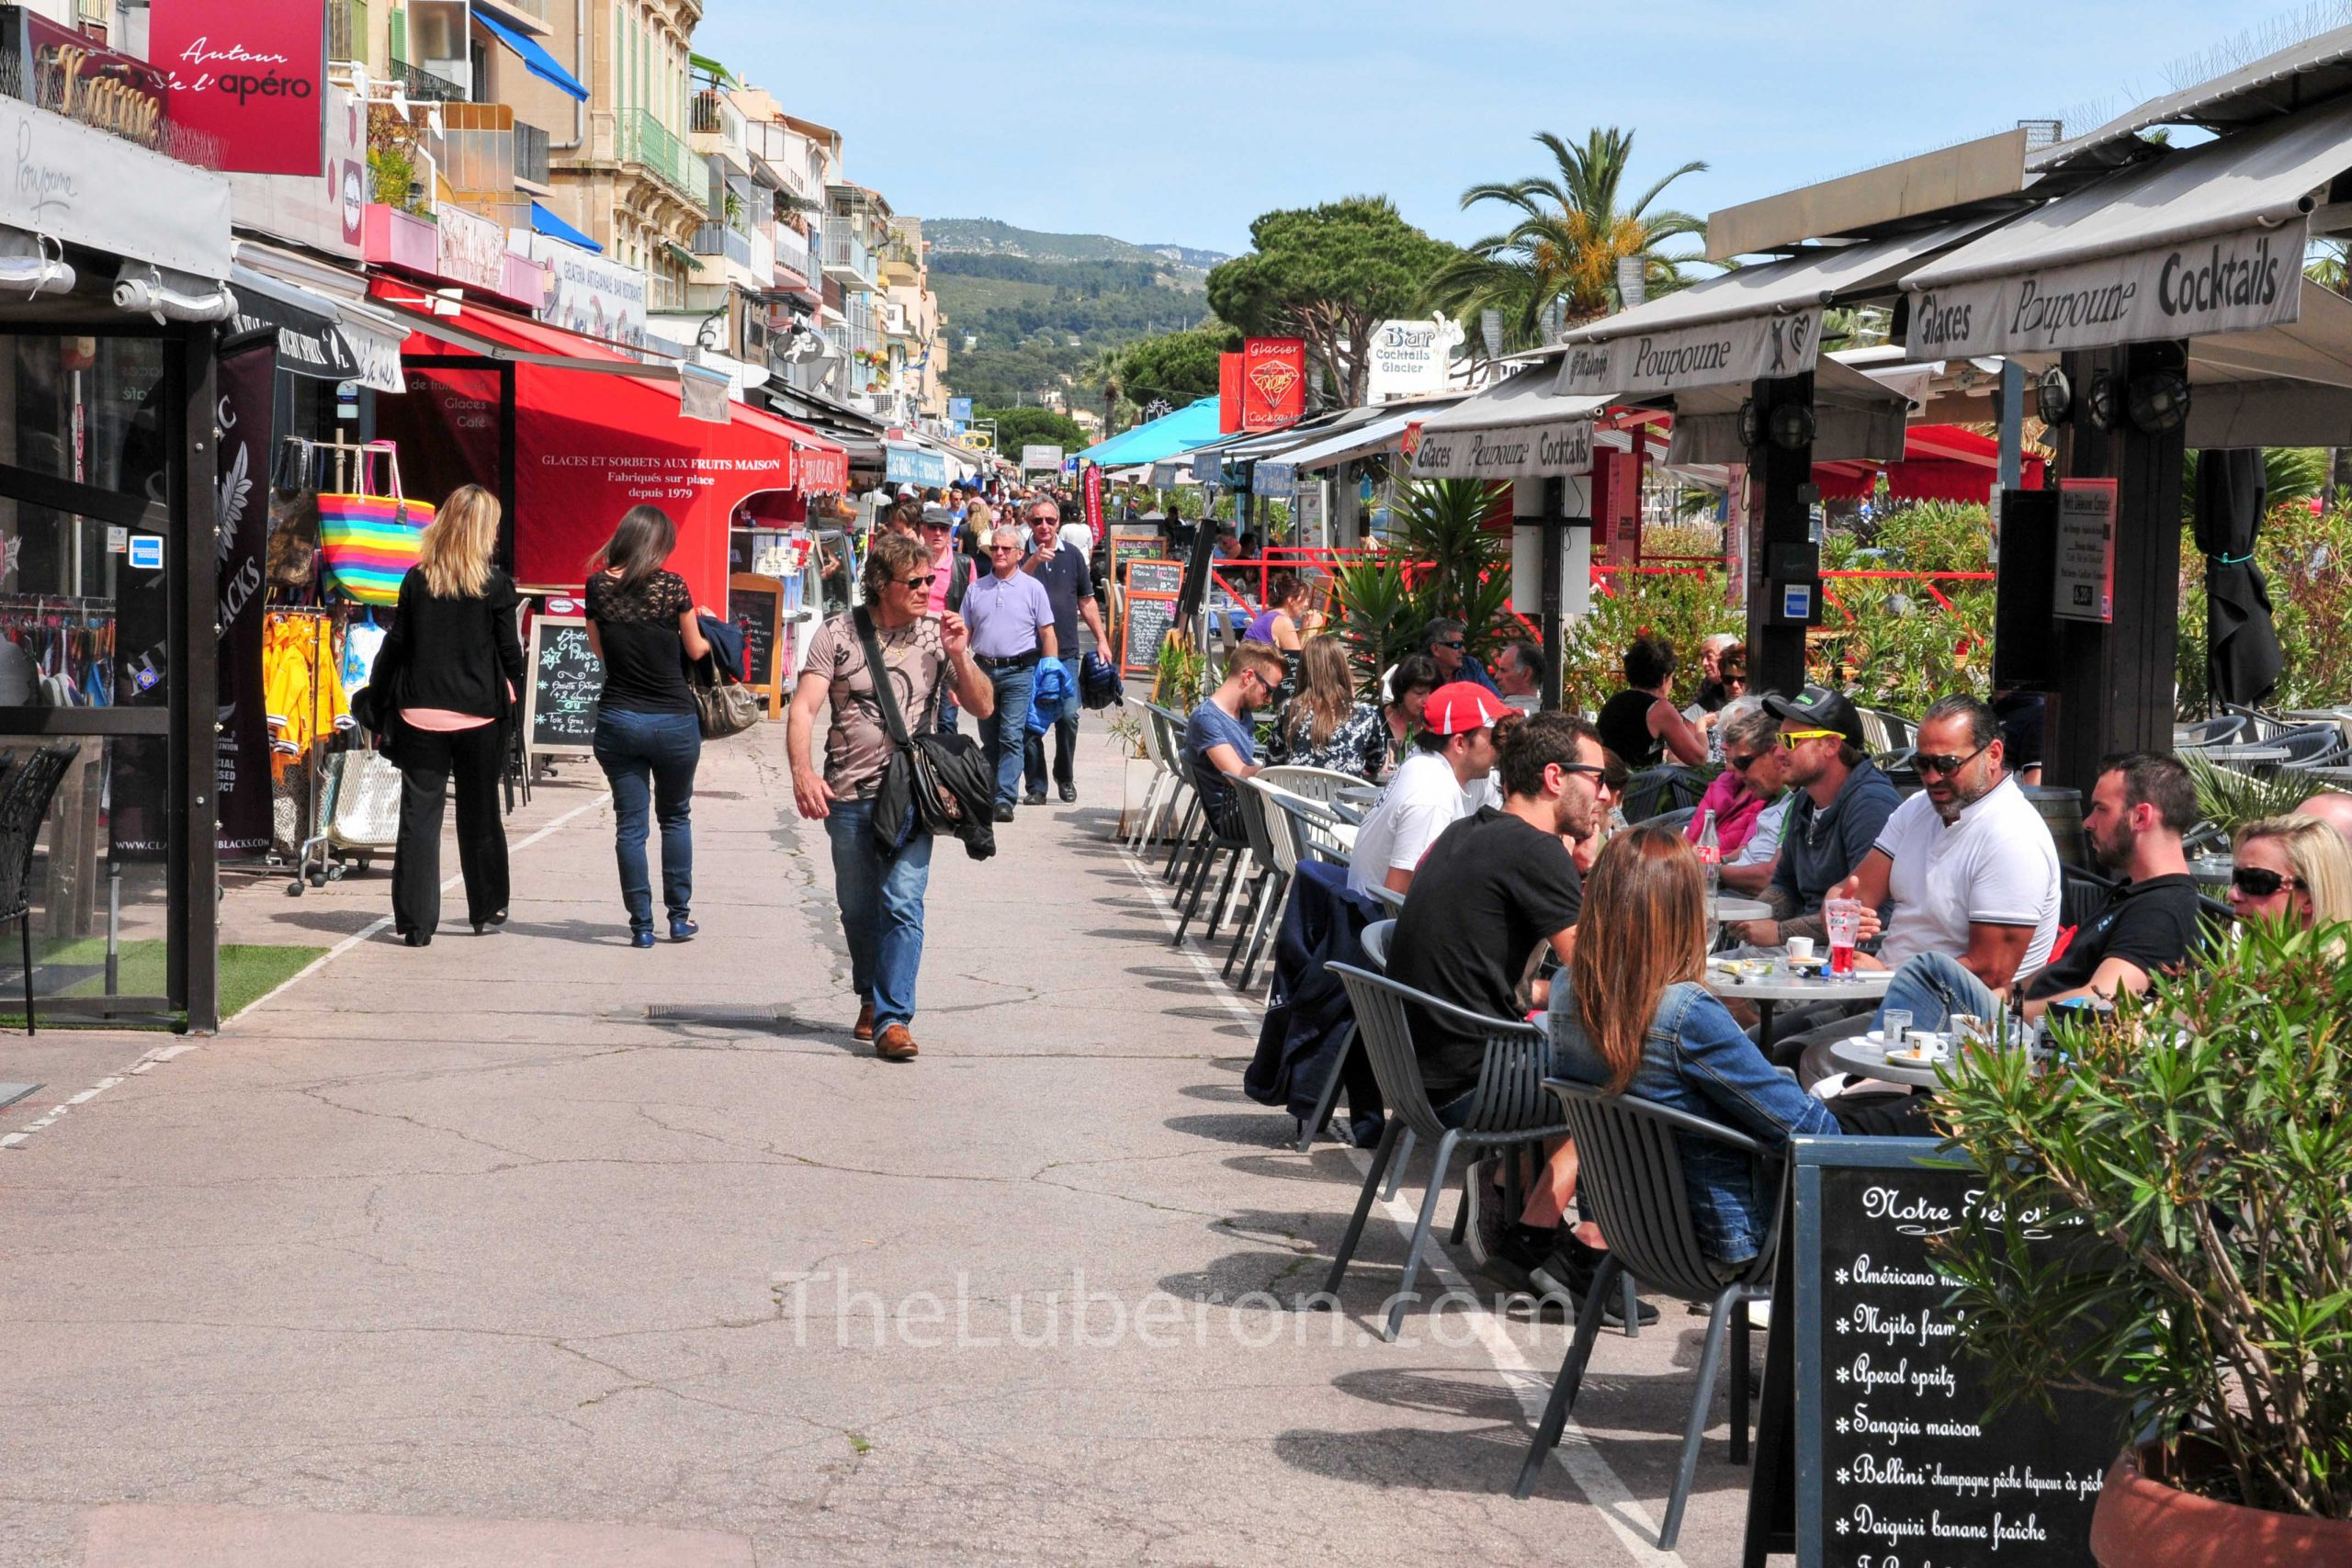 Cafes in Bandol